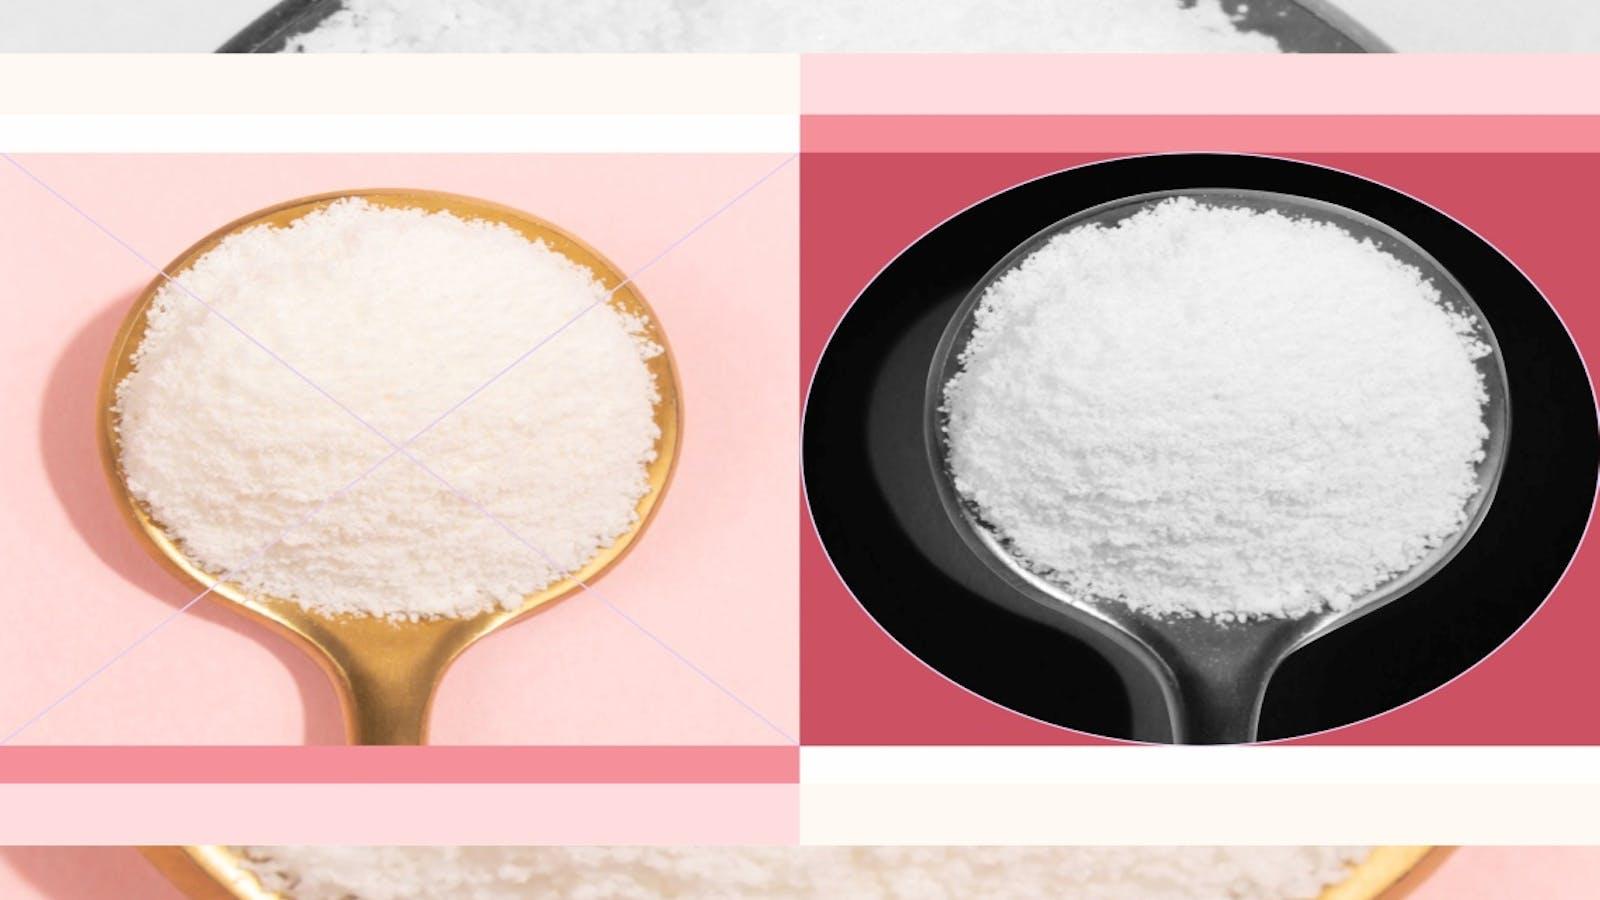 Sources of Collagen Supplements